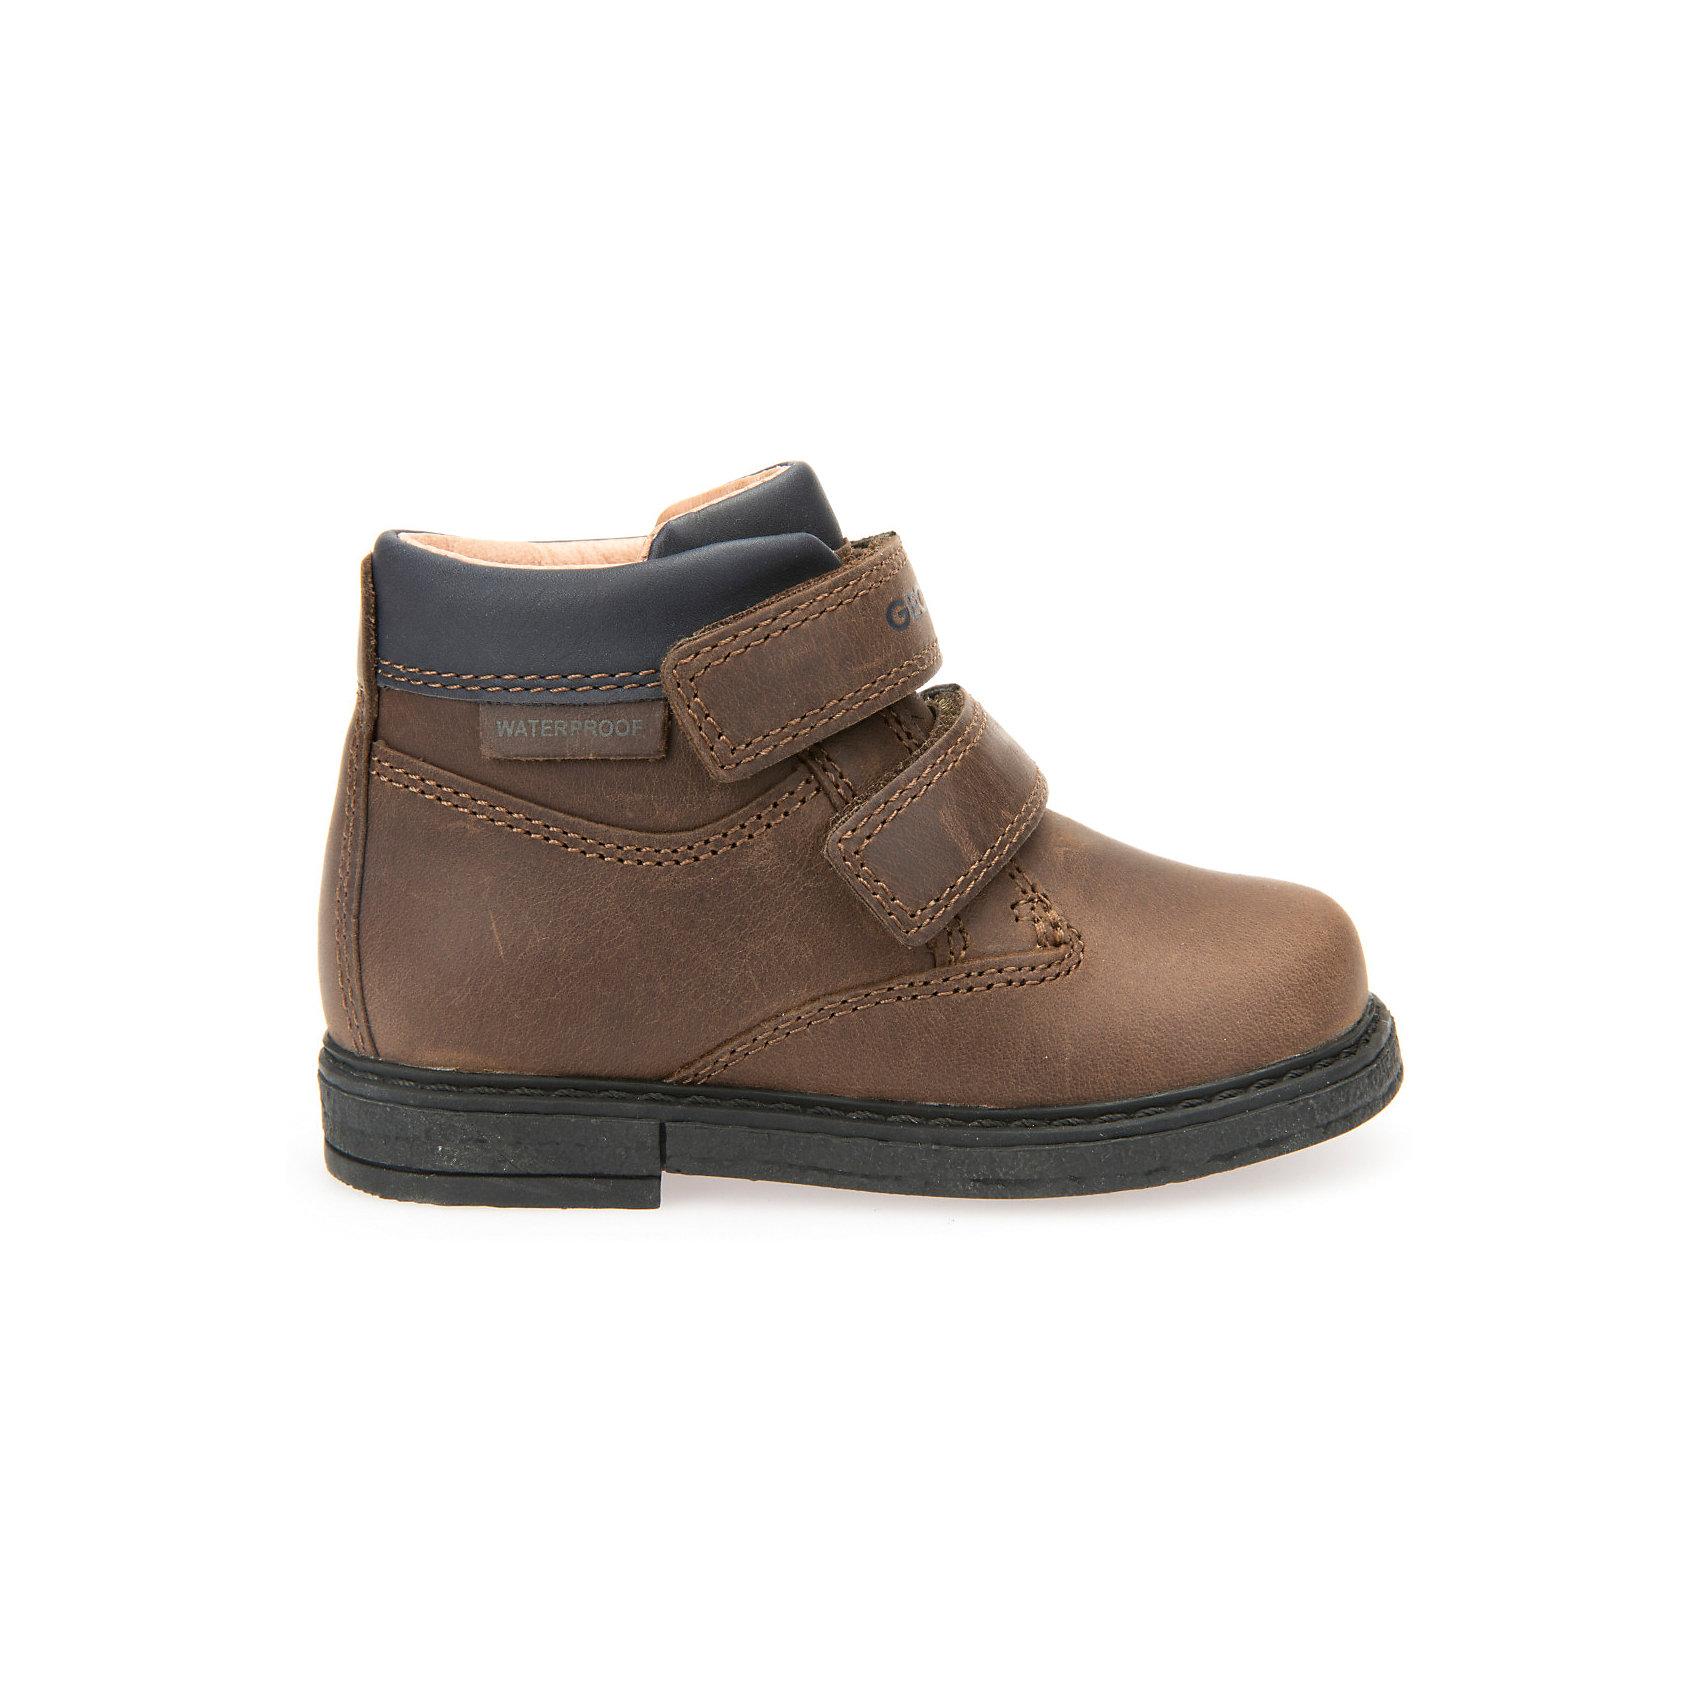 GEOX Полусапоги для мальчика GEOX geox ботинки для мальчика geox